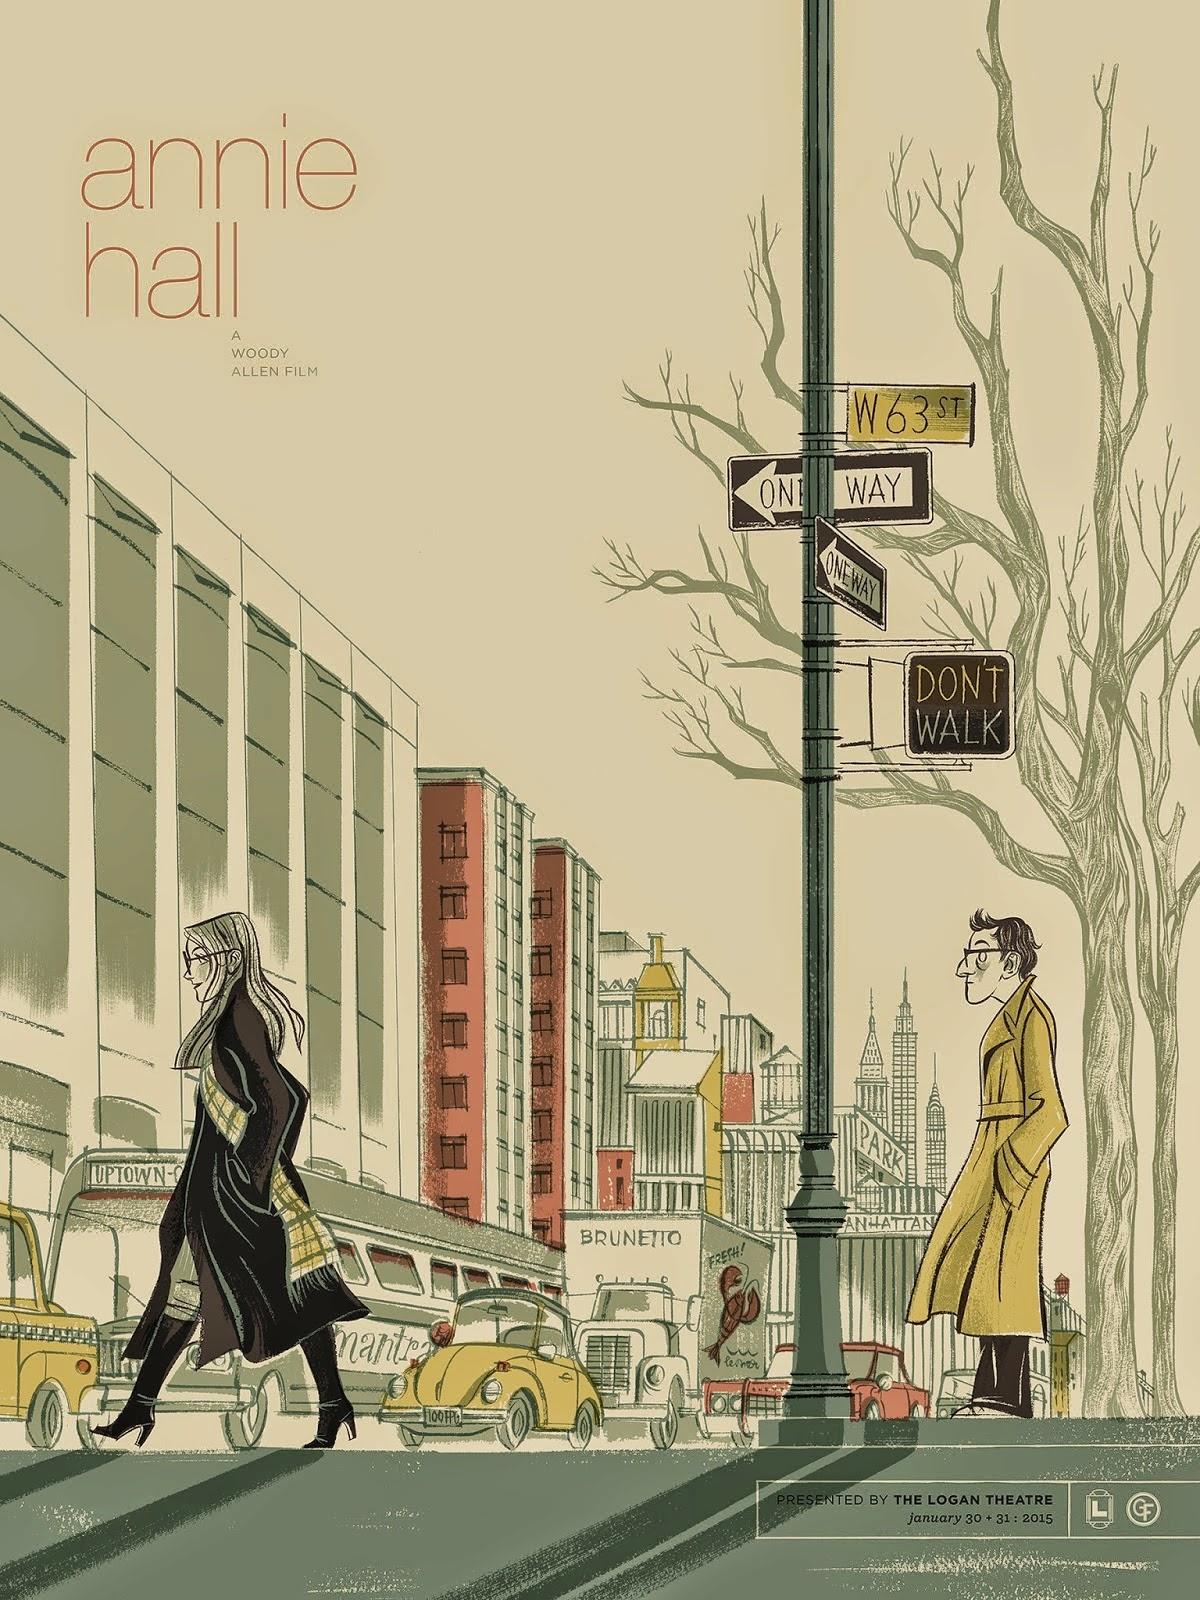 annie hall poster - photo #13